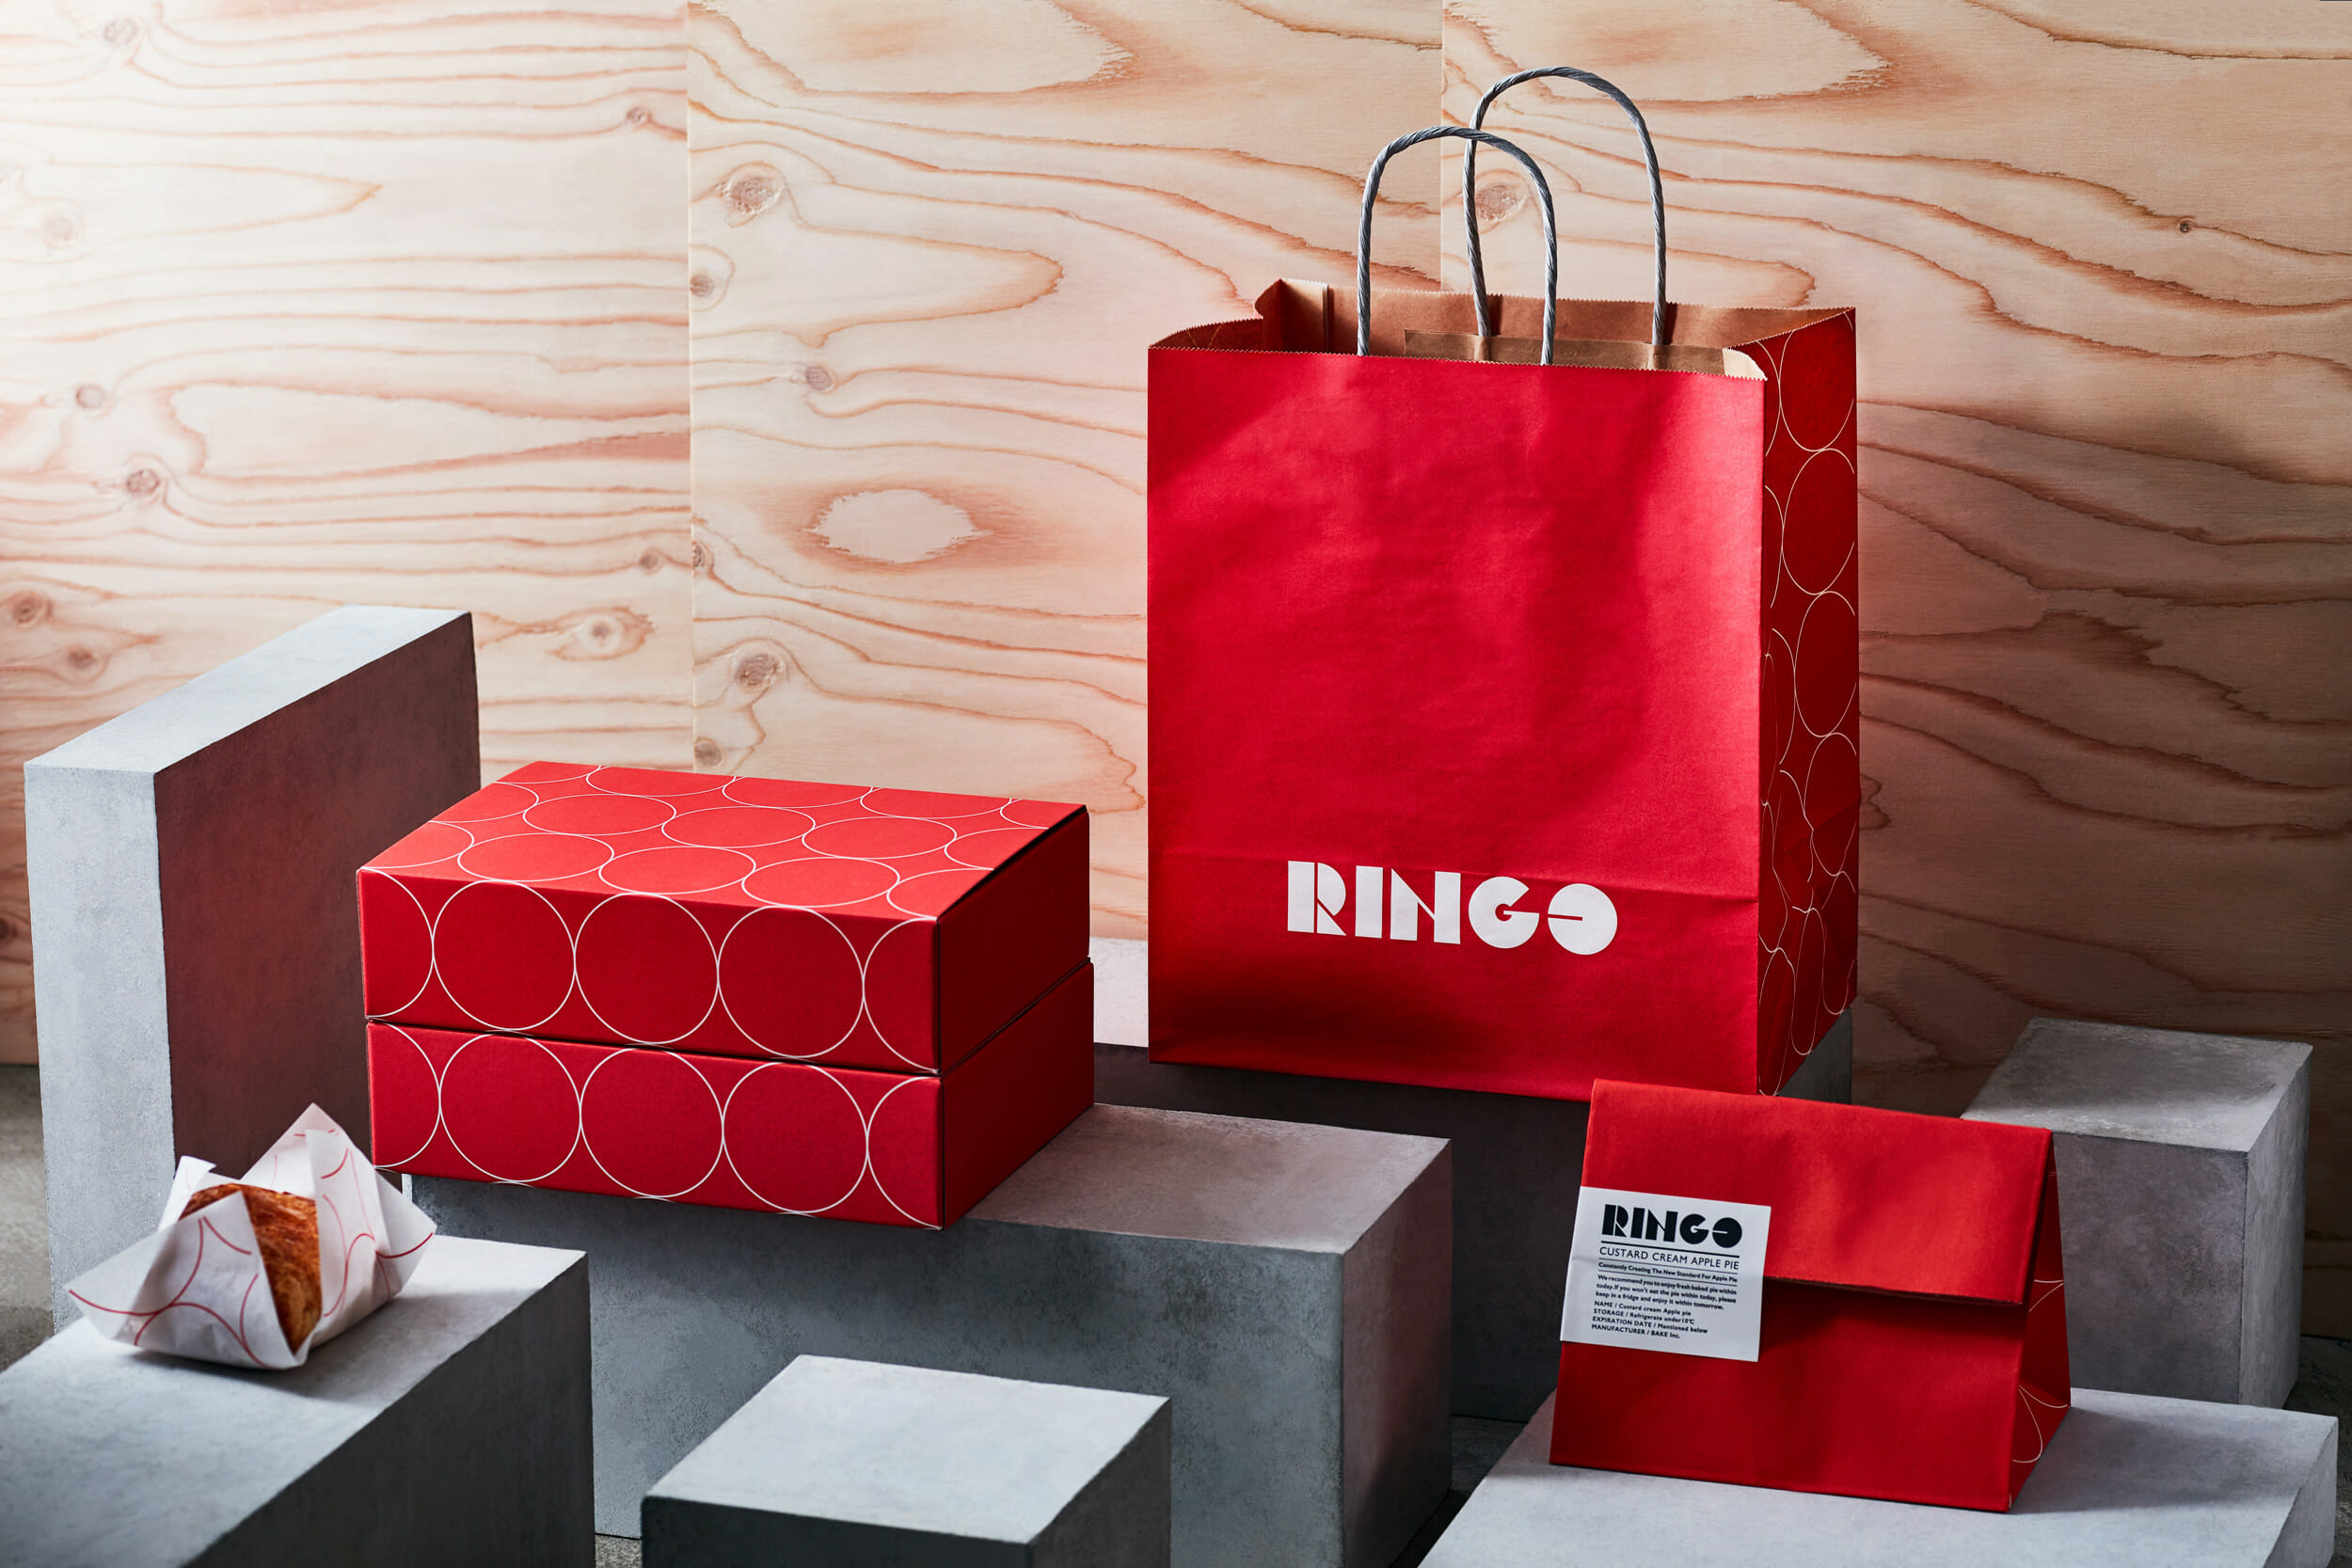 「RINGO」のパッケージデザイン